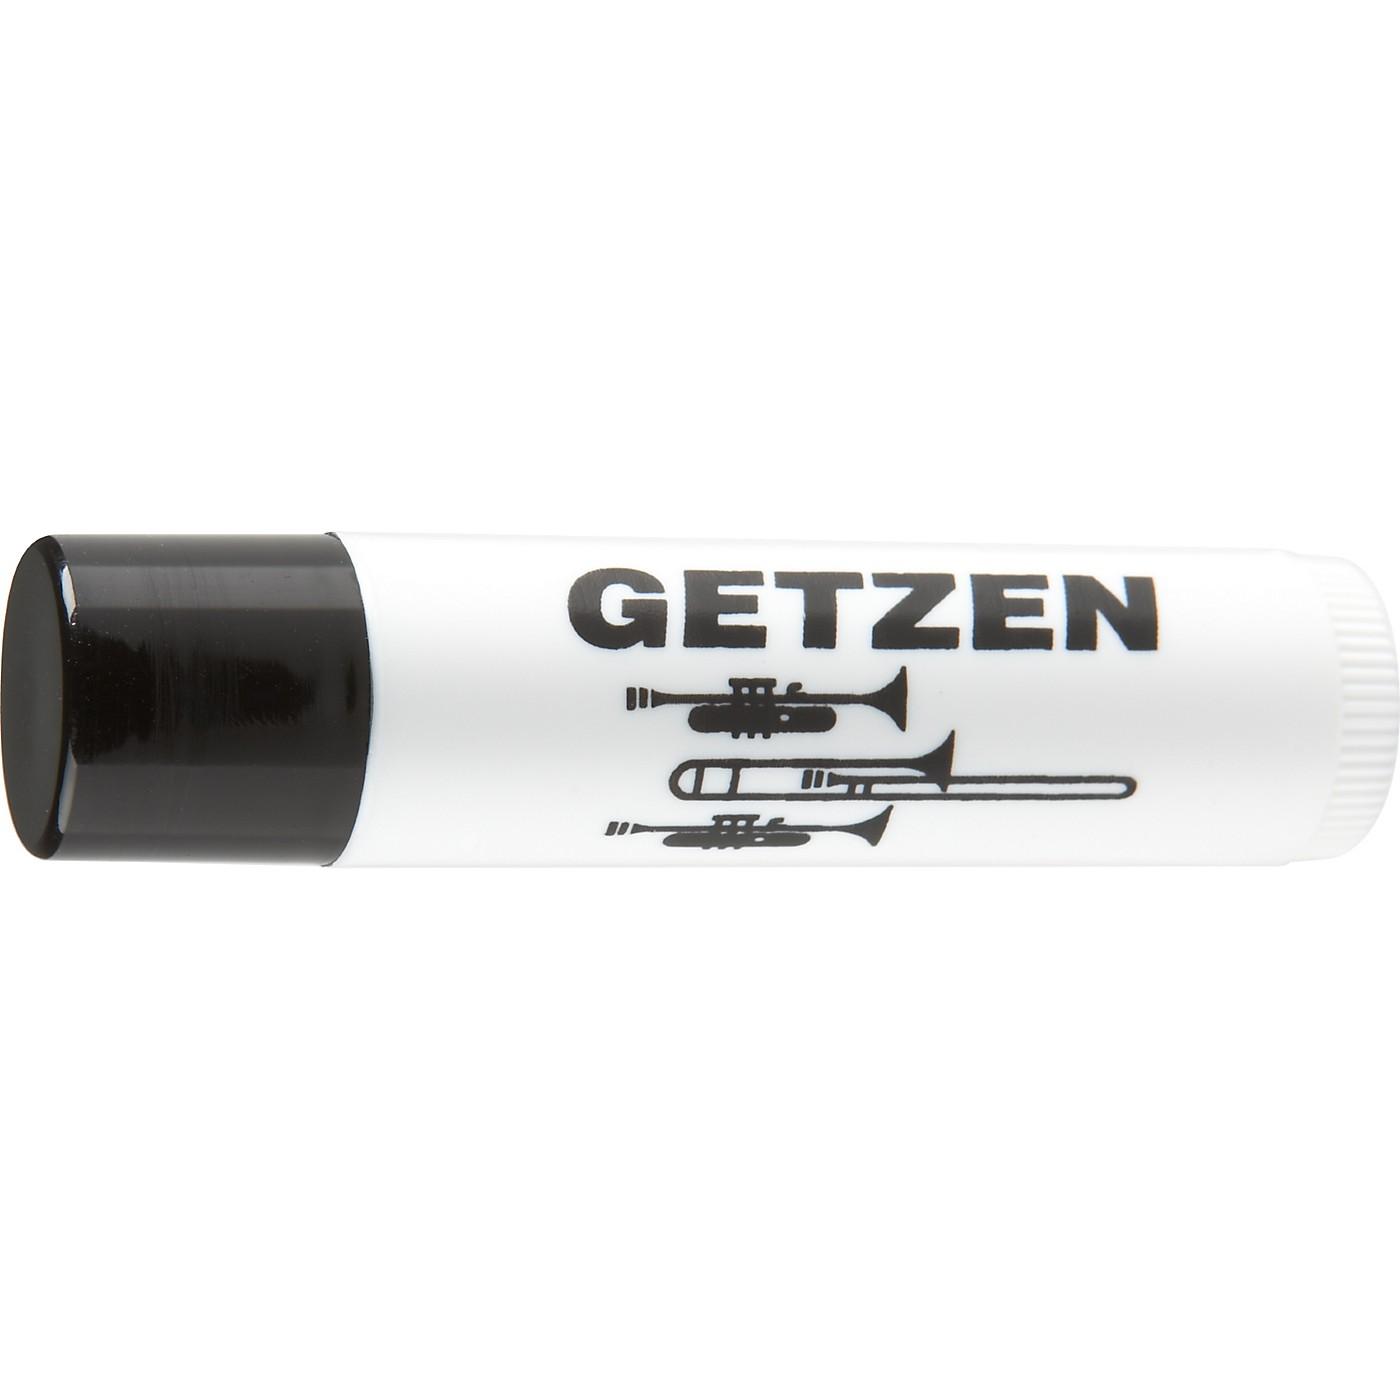 Getzen Tuning Slide Grease thumbnail